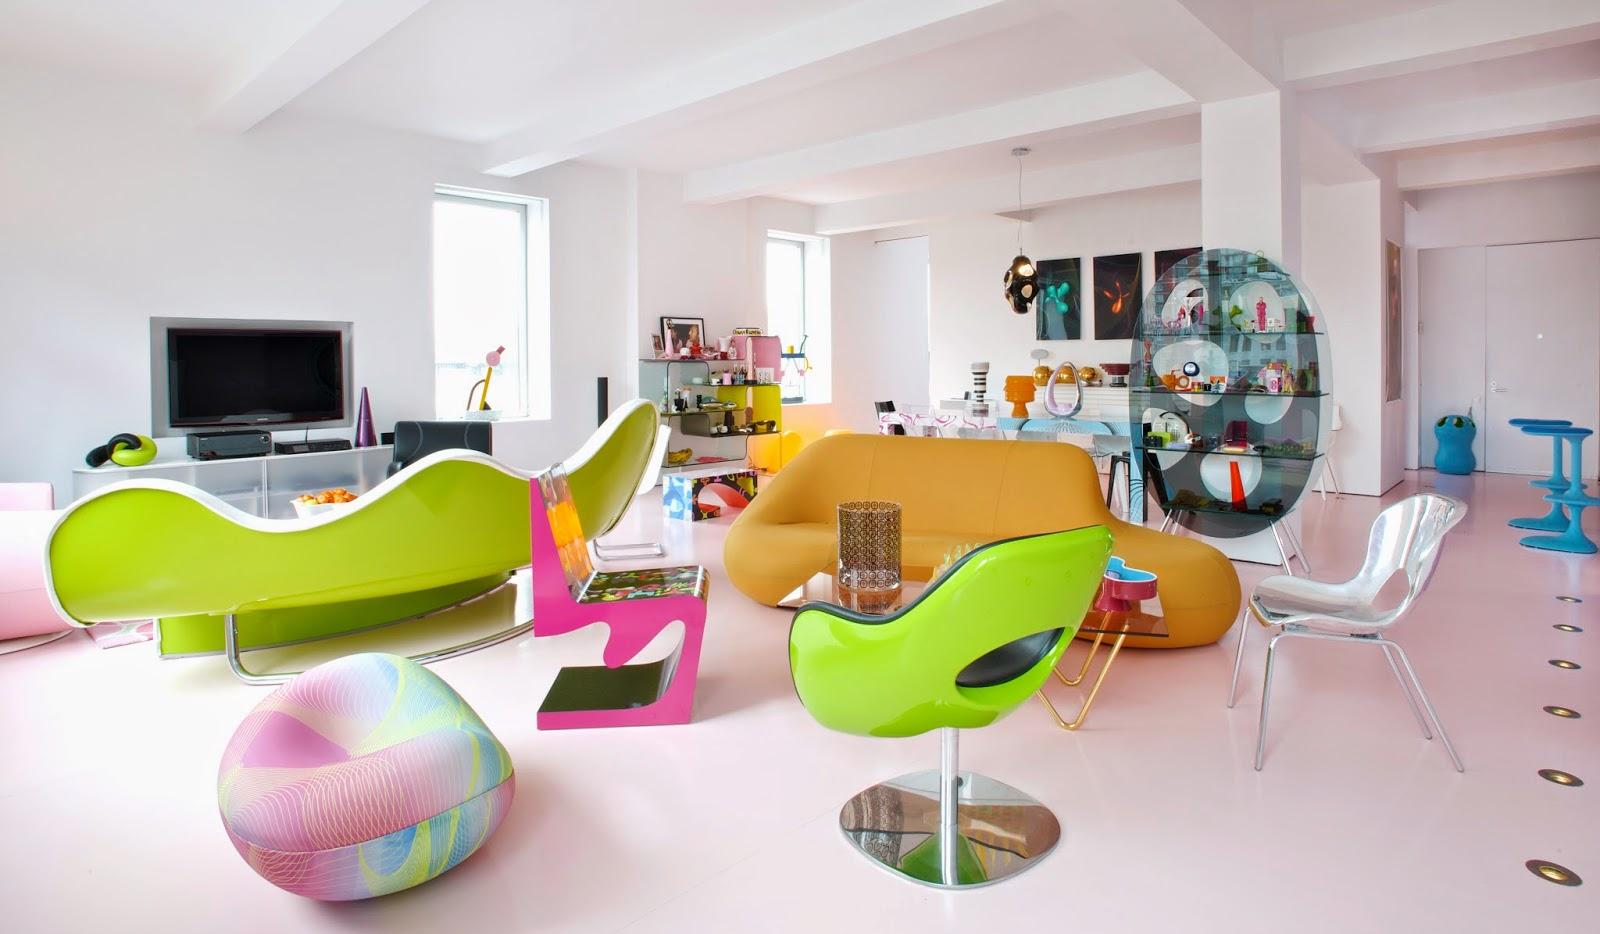 Мебель в стиле техно